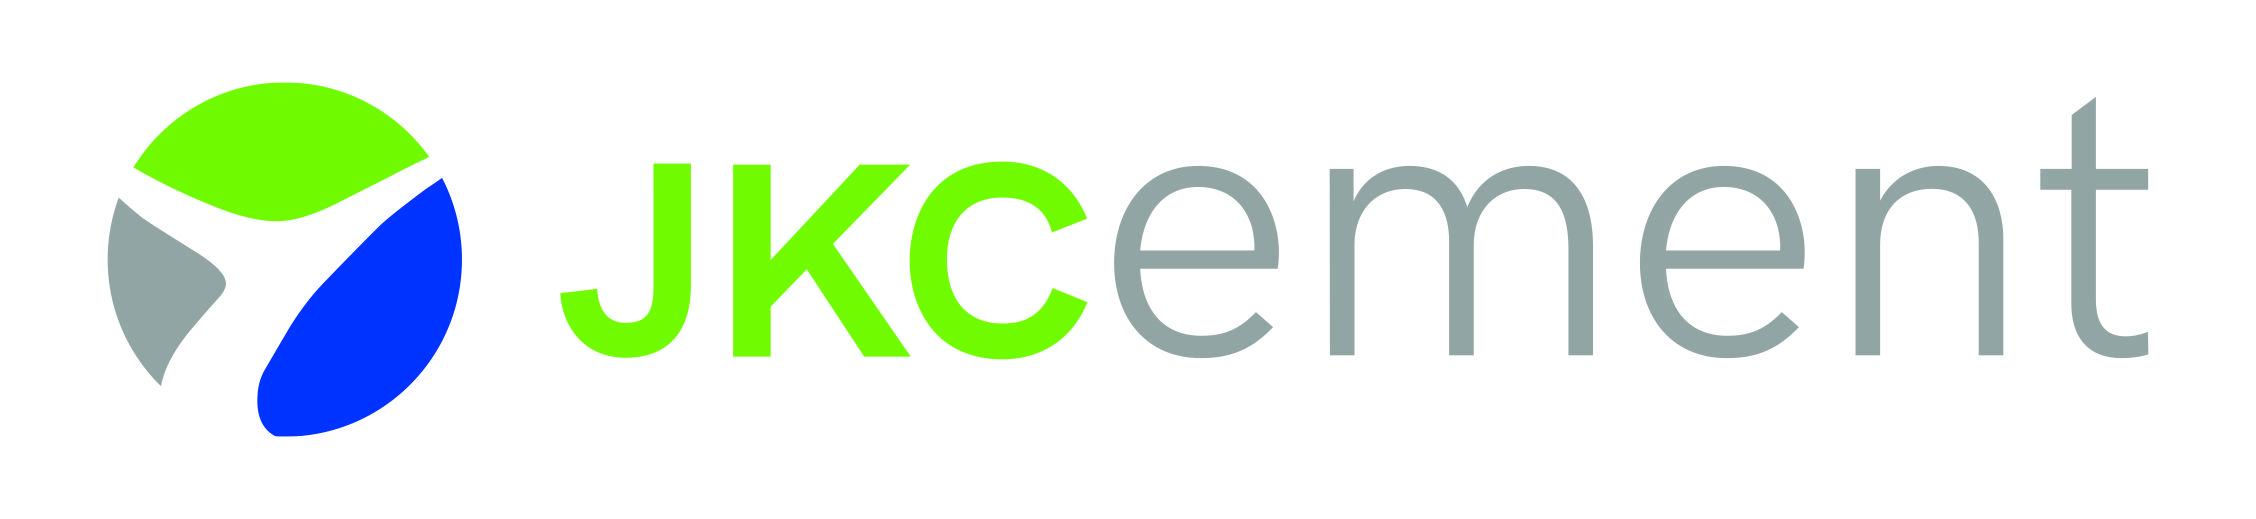 JK Cement Unveils New Corporate Brand identity